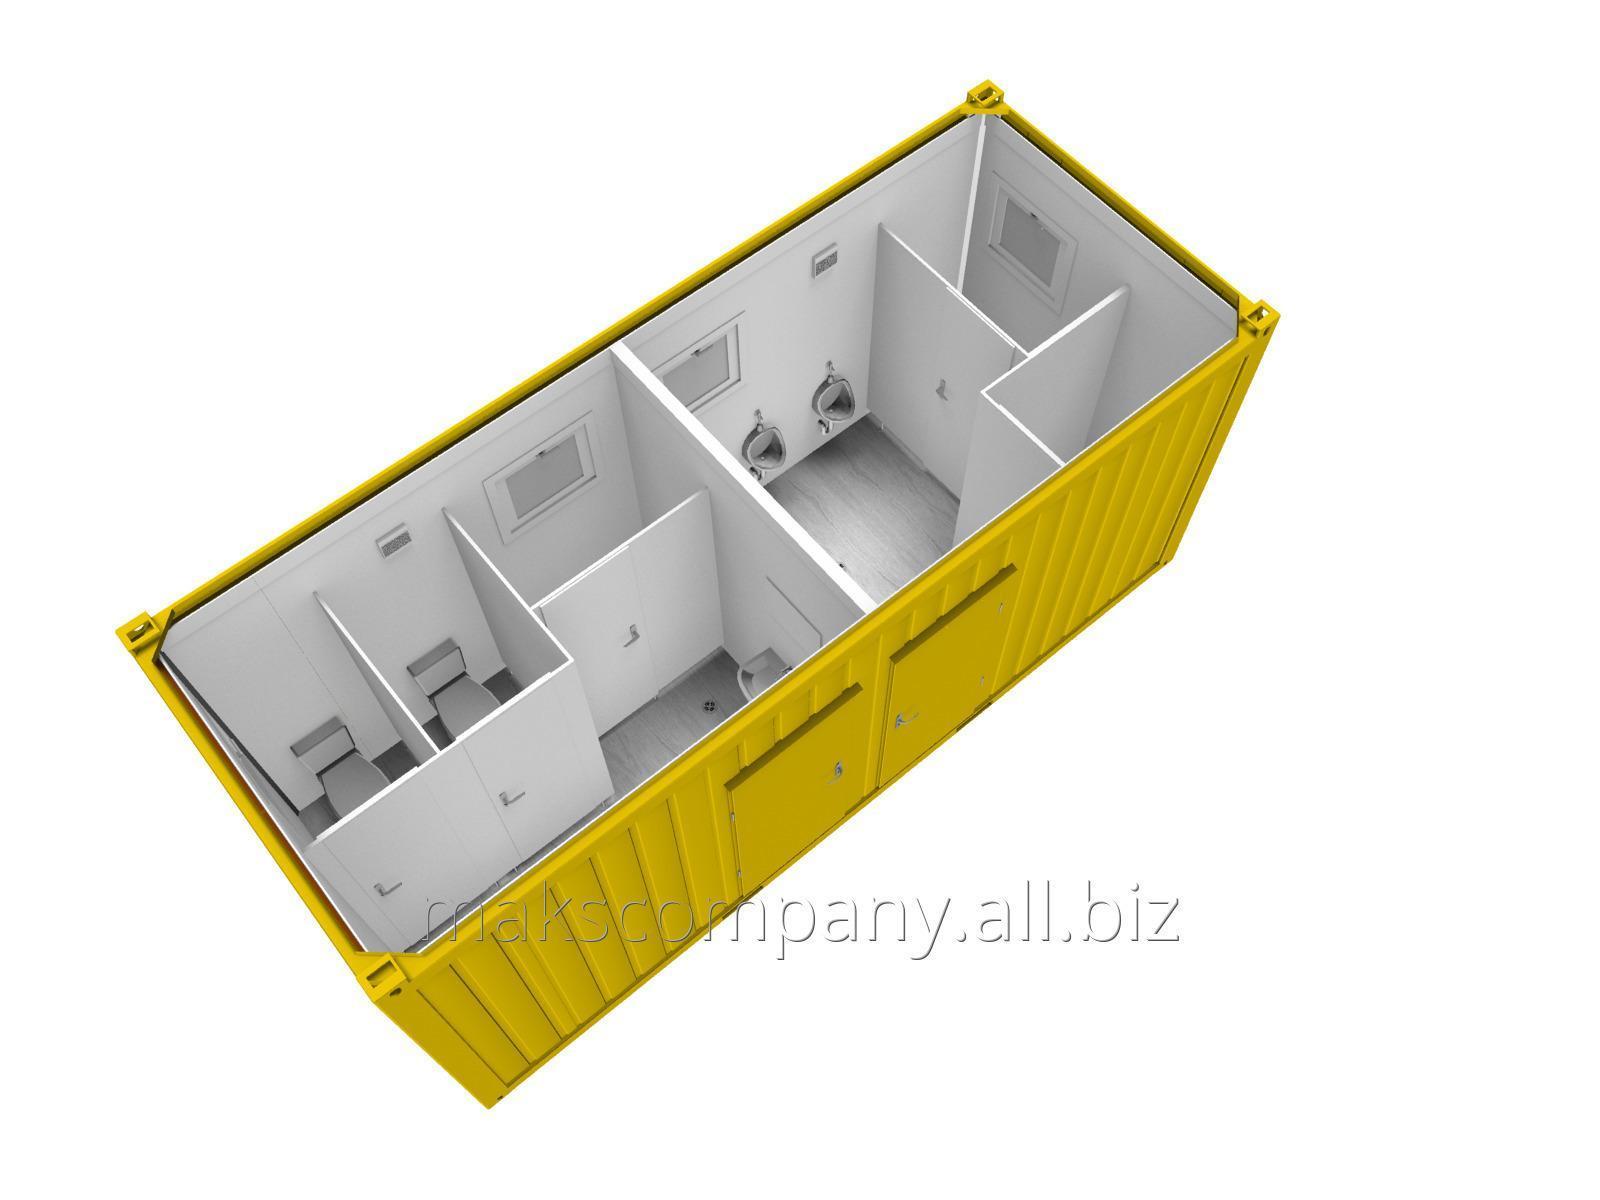 sanitarnyj_kontejner_30_i_futovyj